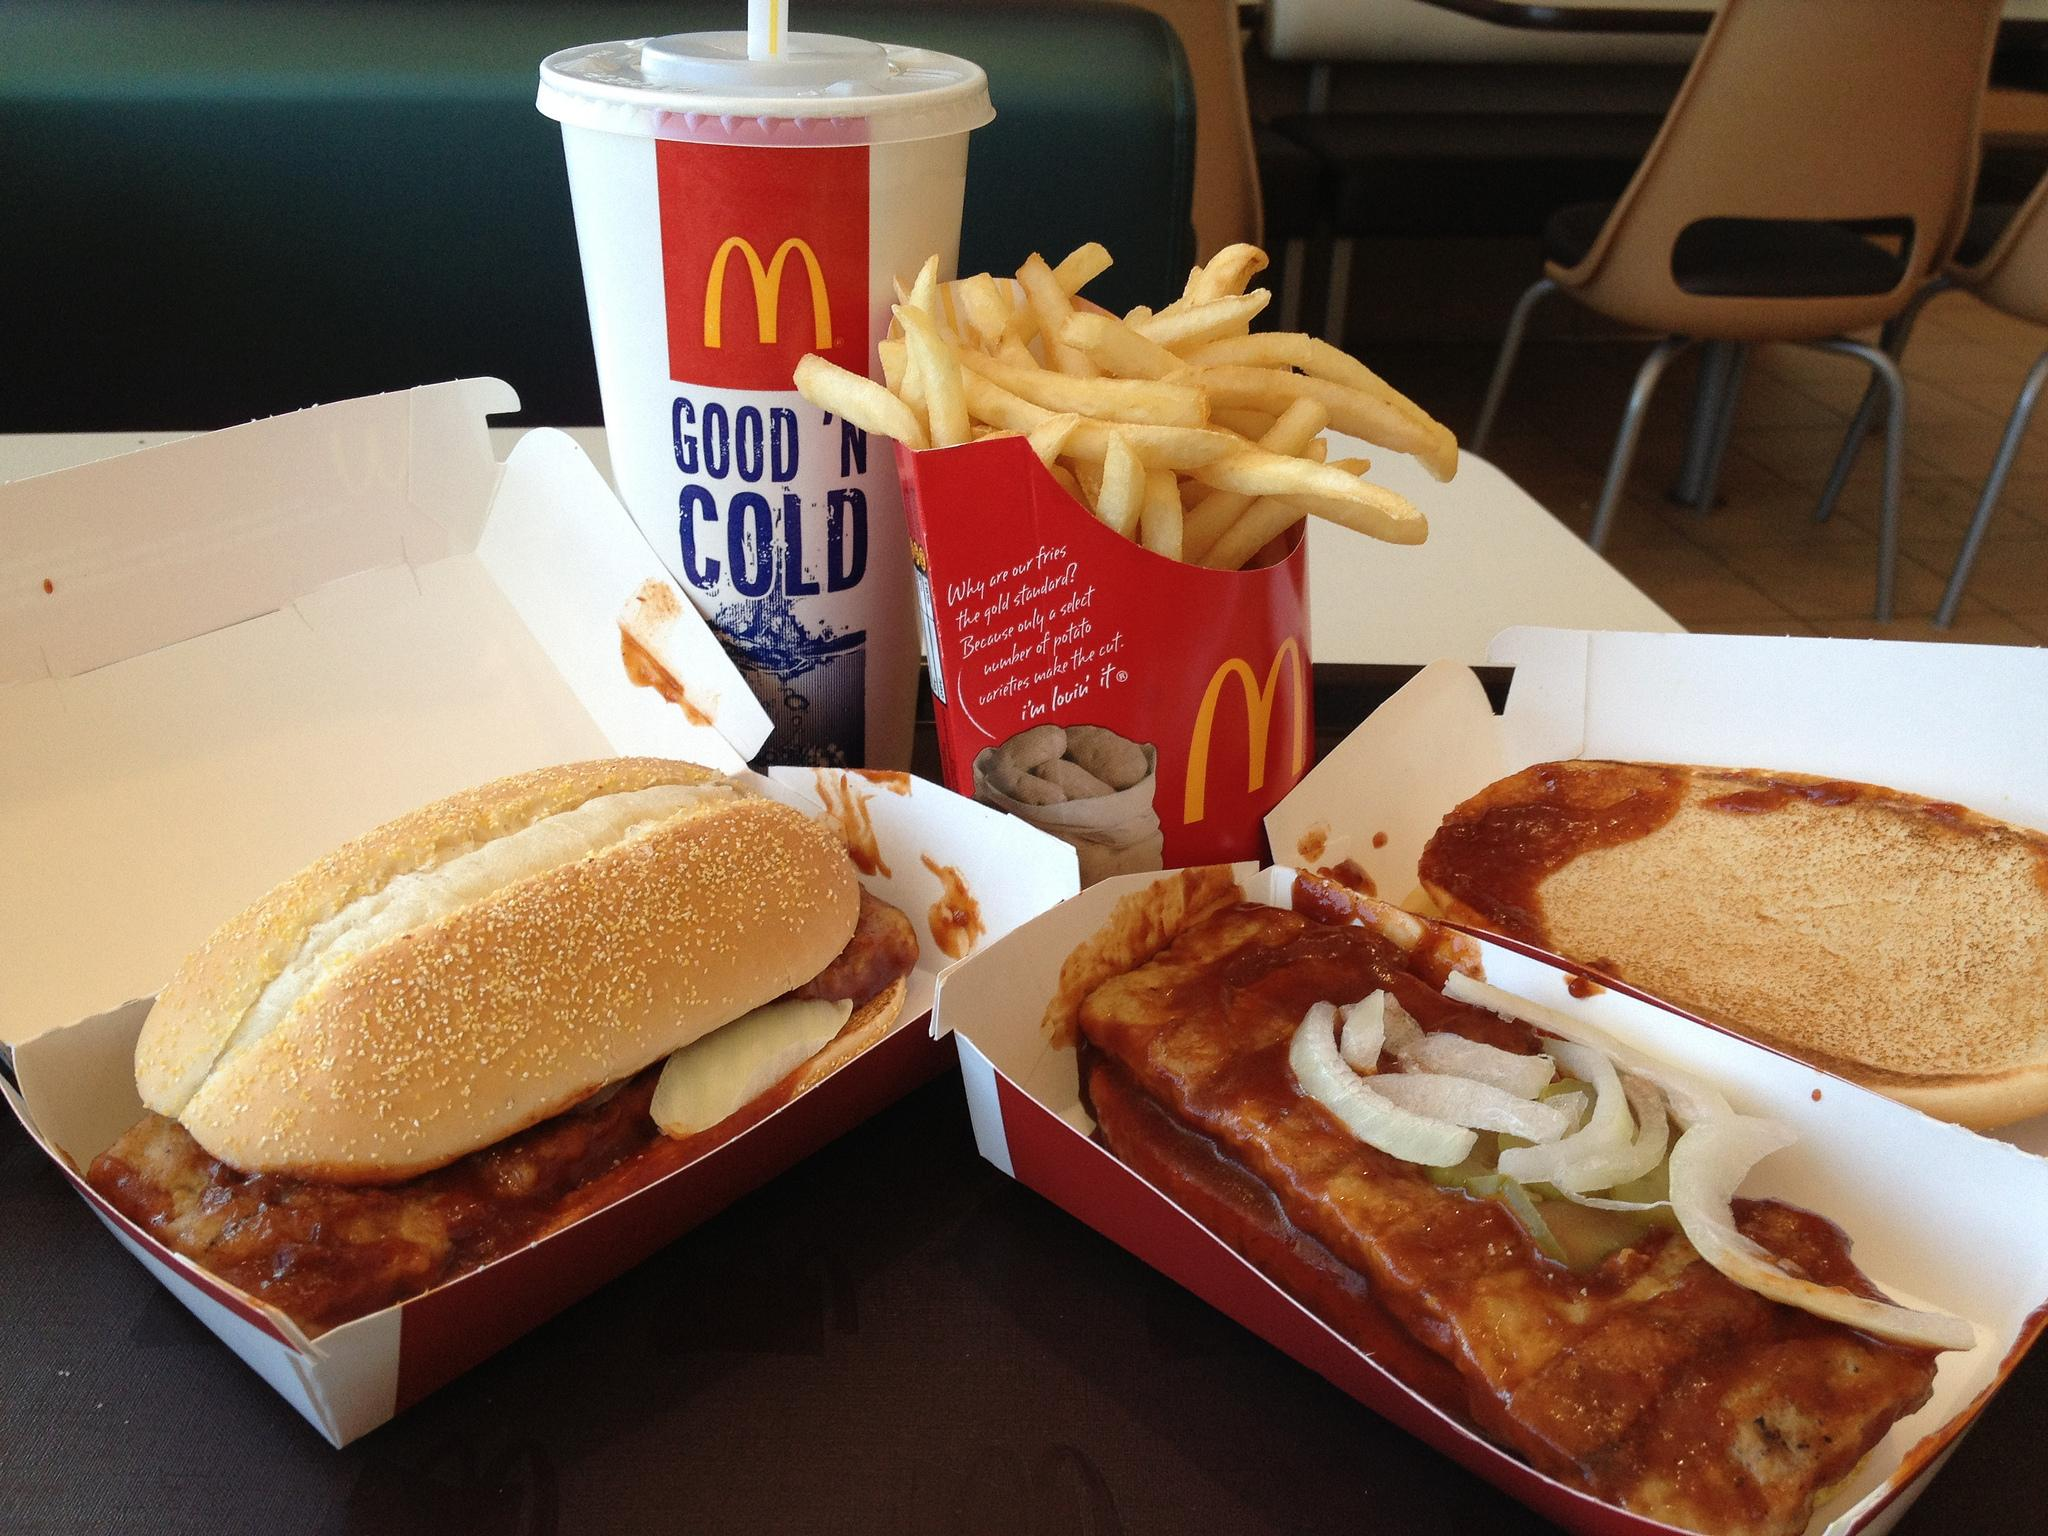 mc donald fast food restaurants essay